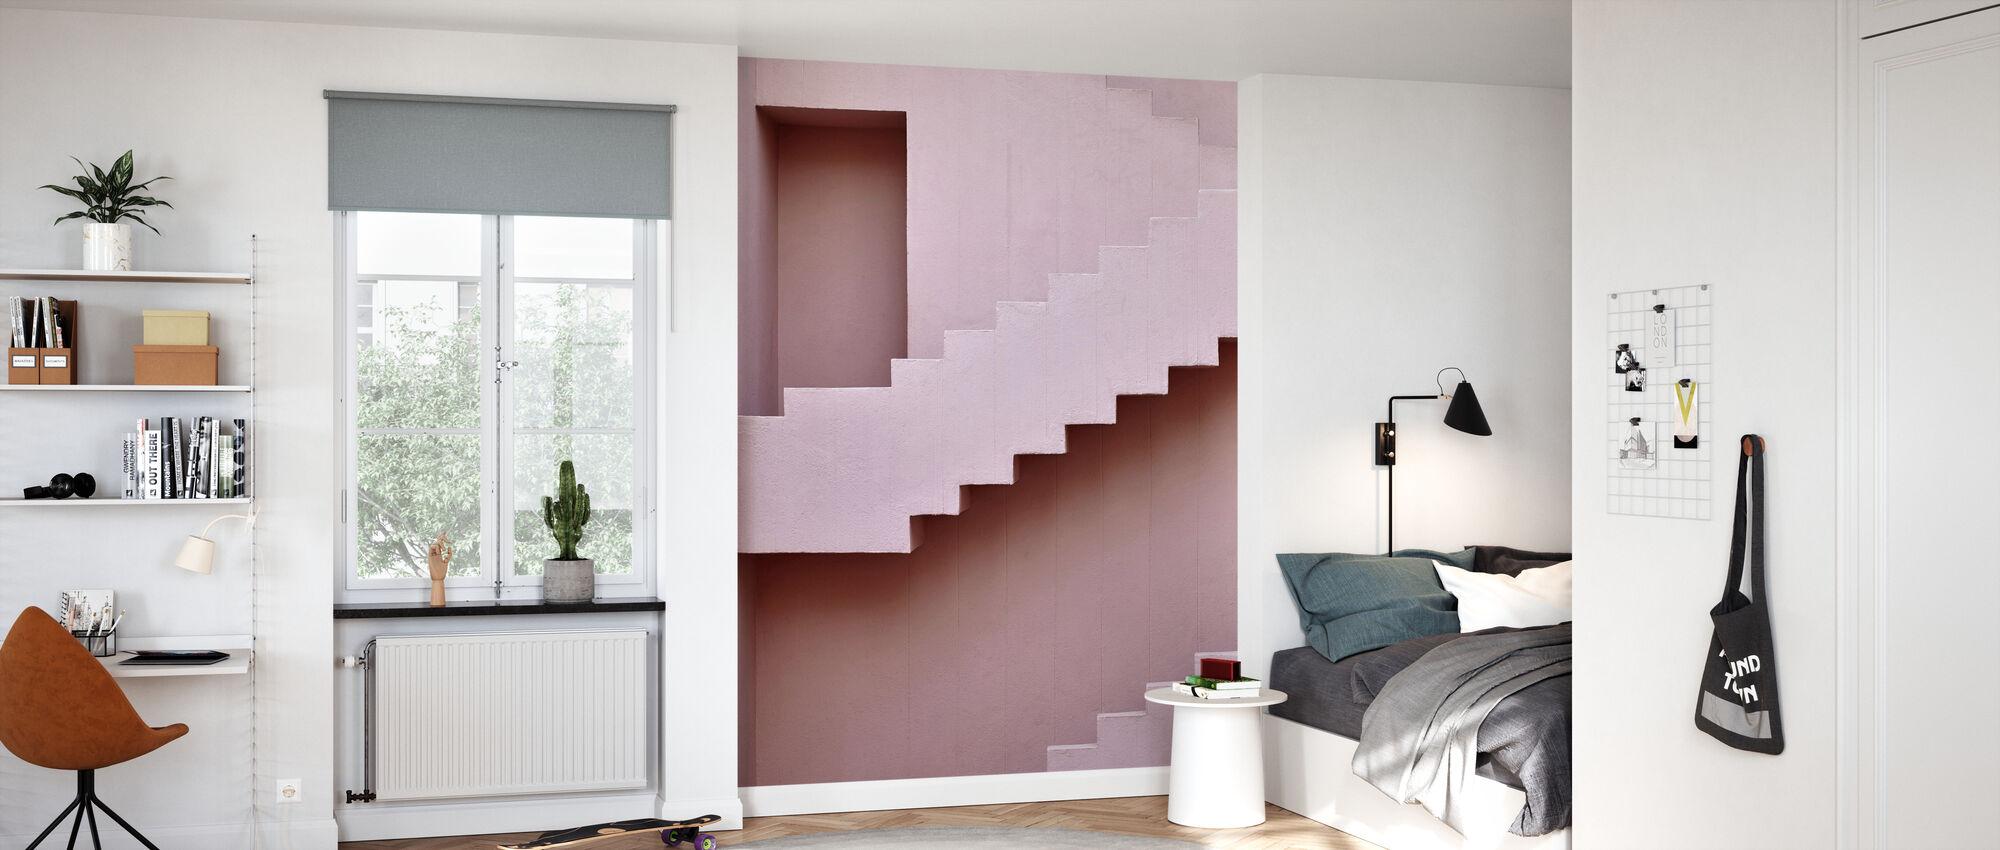 Next Level - Wallpaper - Kids Room